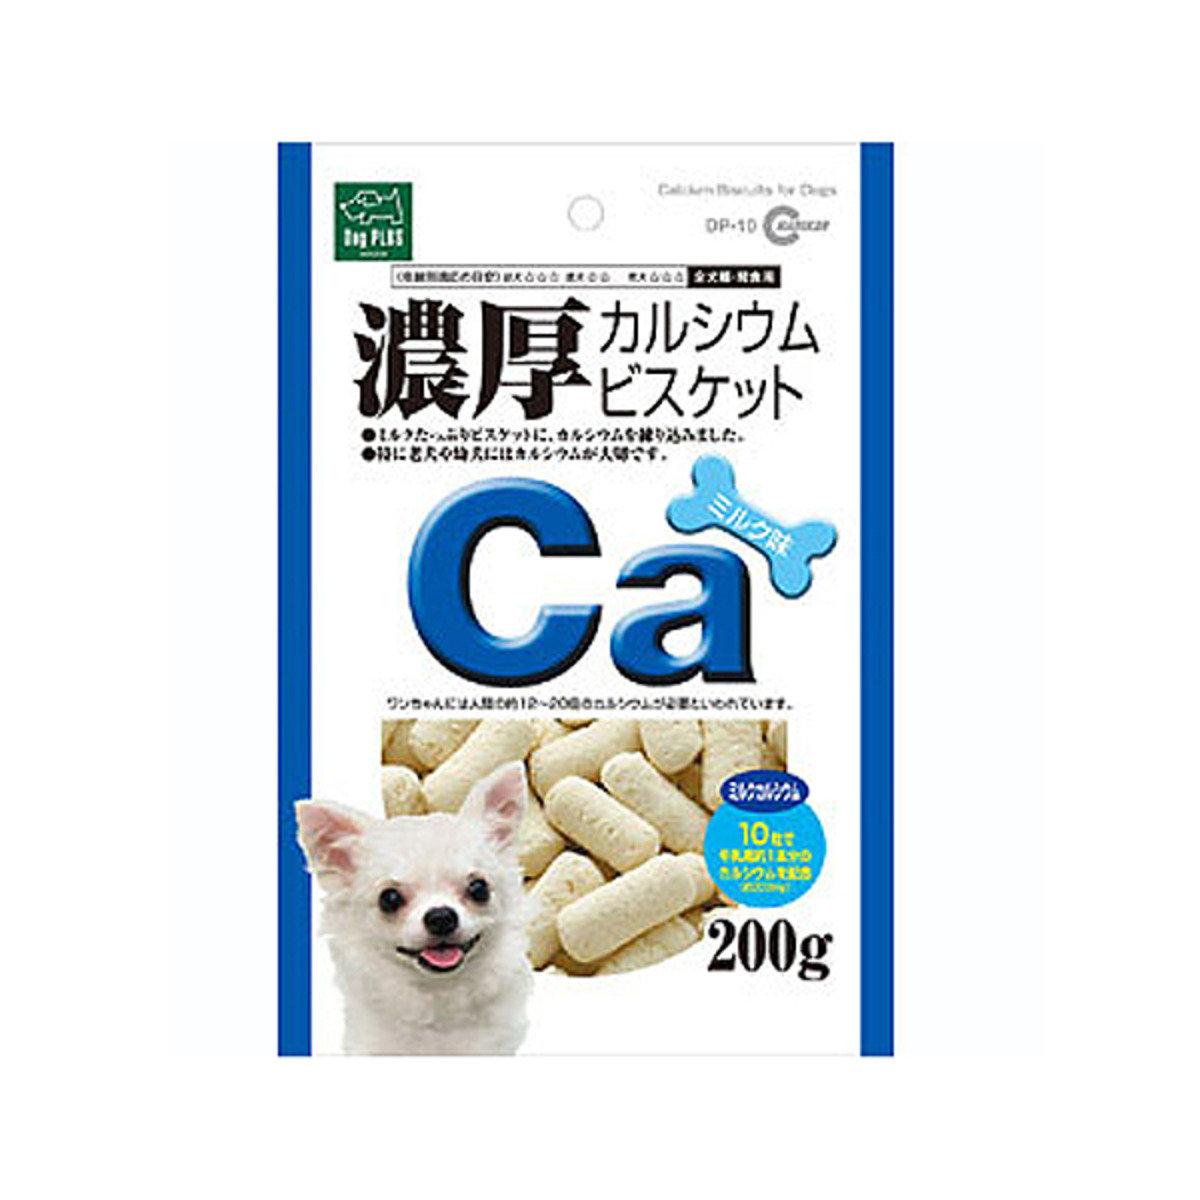 MR52775 日本 MARUKAN 高鈣牛奶餅乾